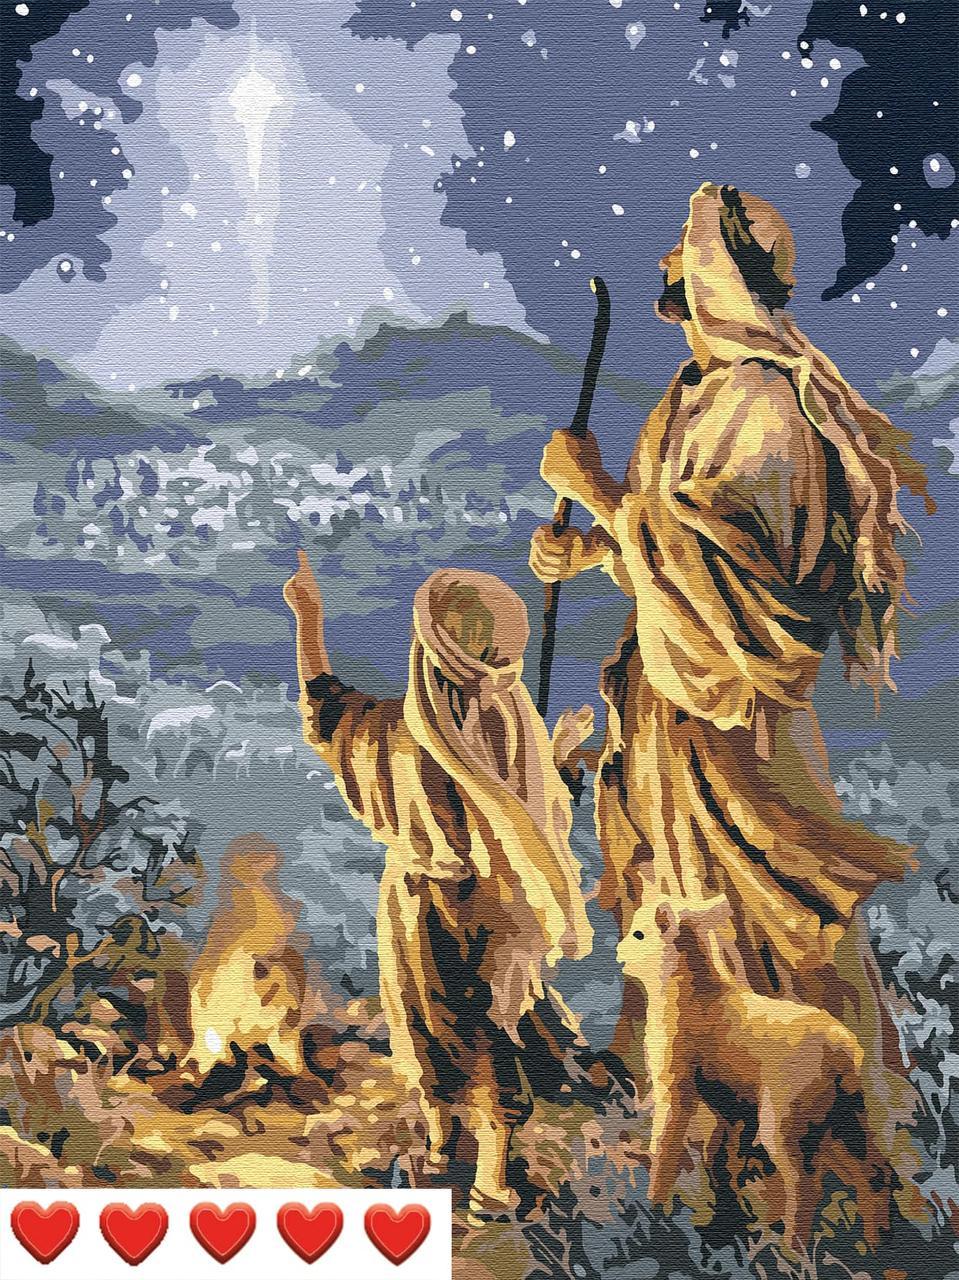 Картина по номерам (рисование по цифрам, живопись) 0040Л1 (Звезда и пастухи)